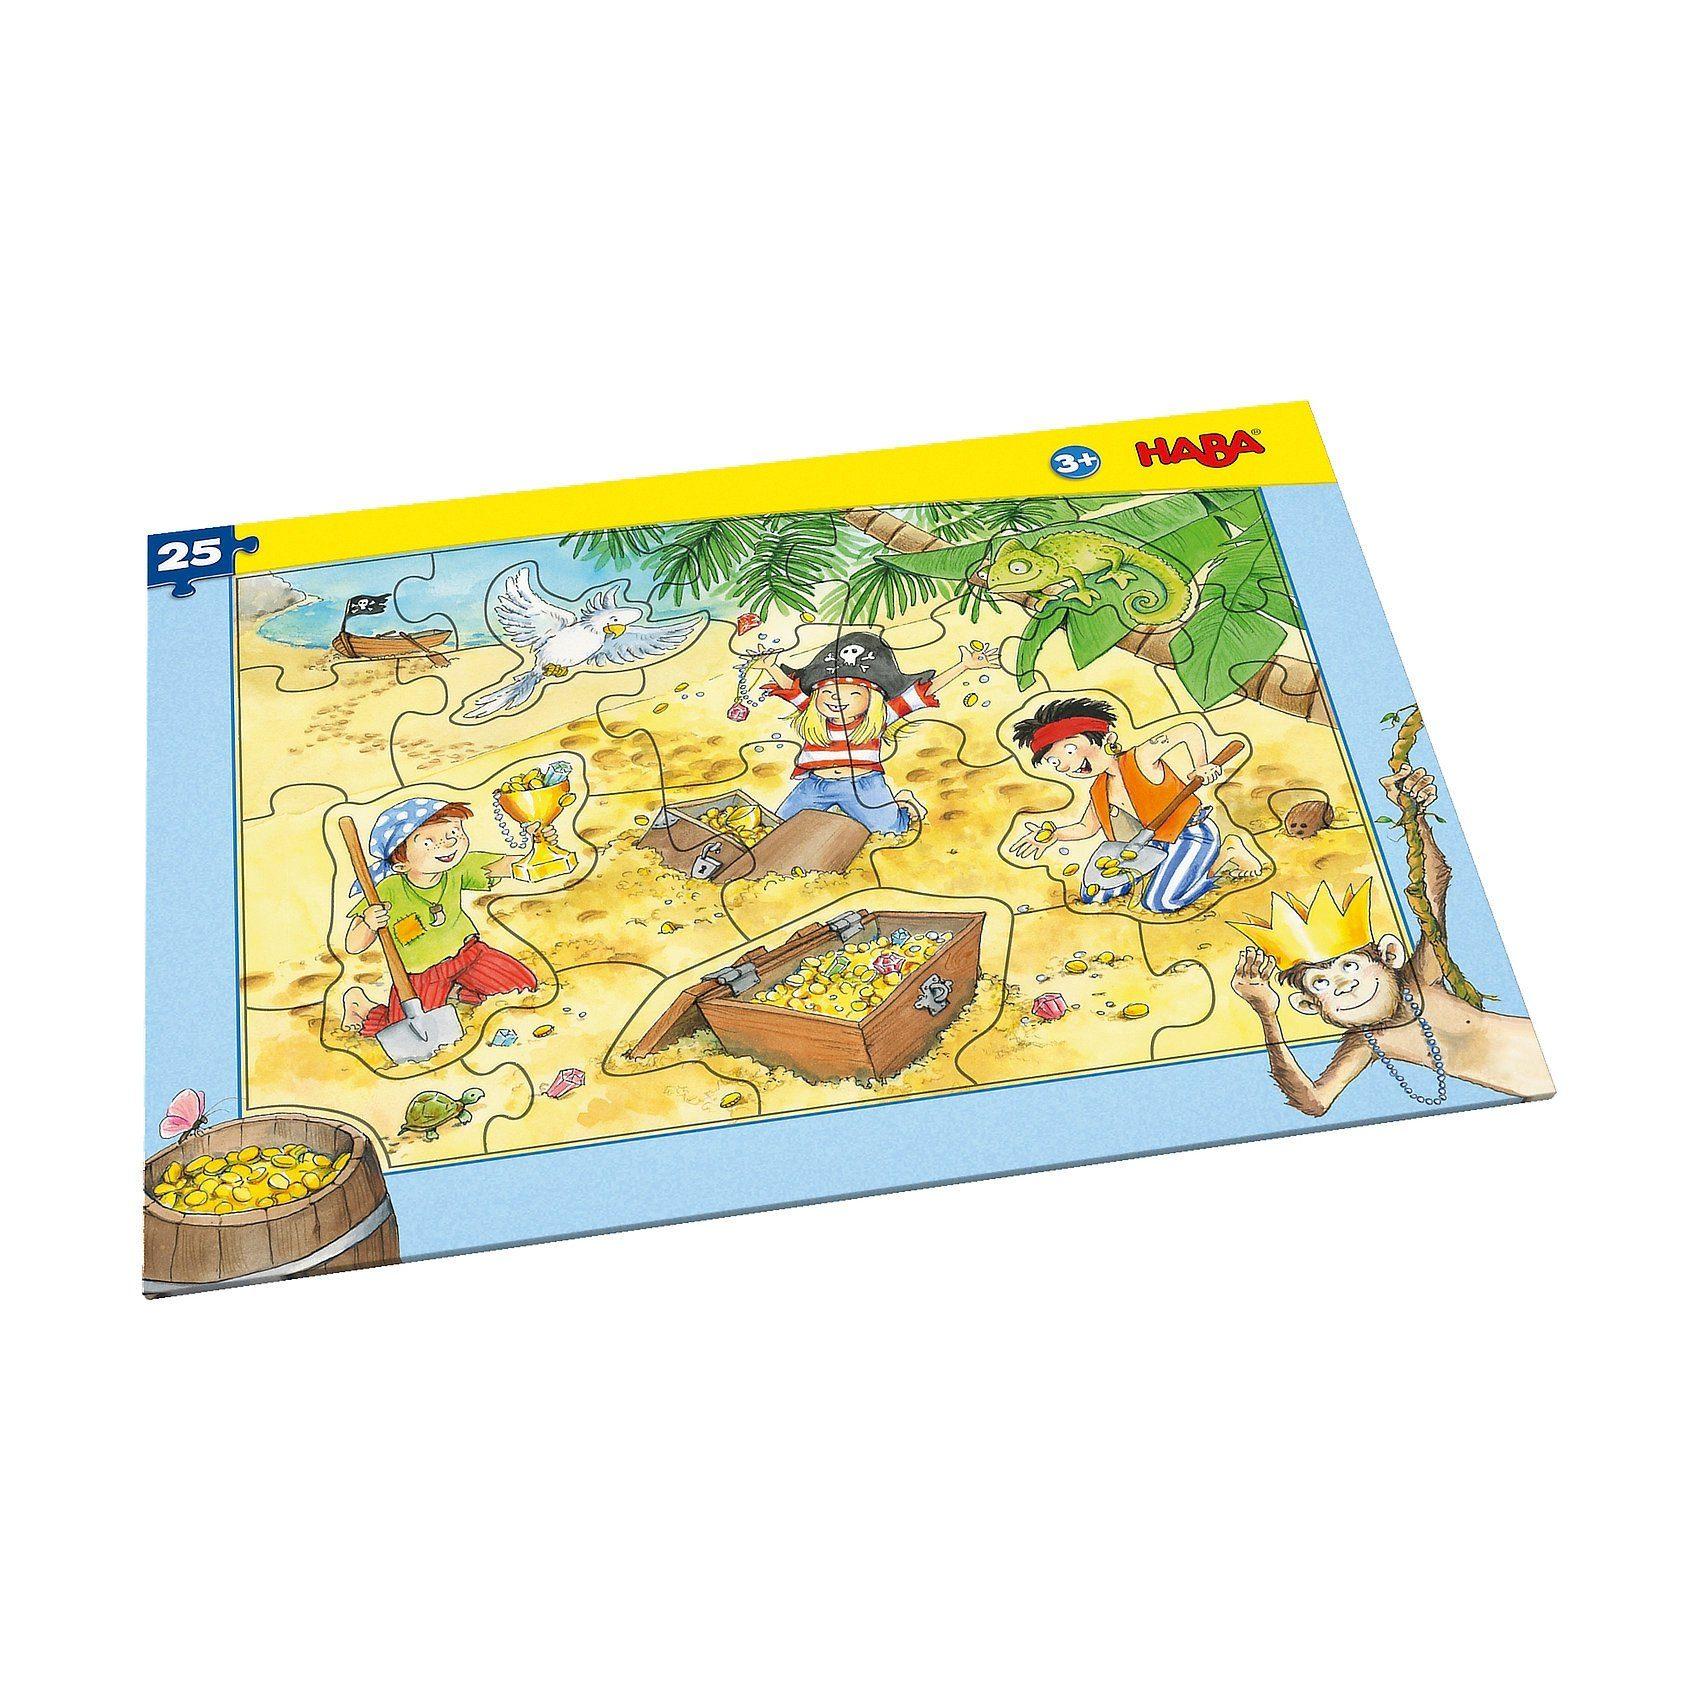 Haba Rahmenpuzzle 25 Teile - Piratengold